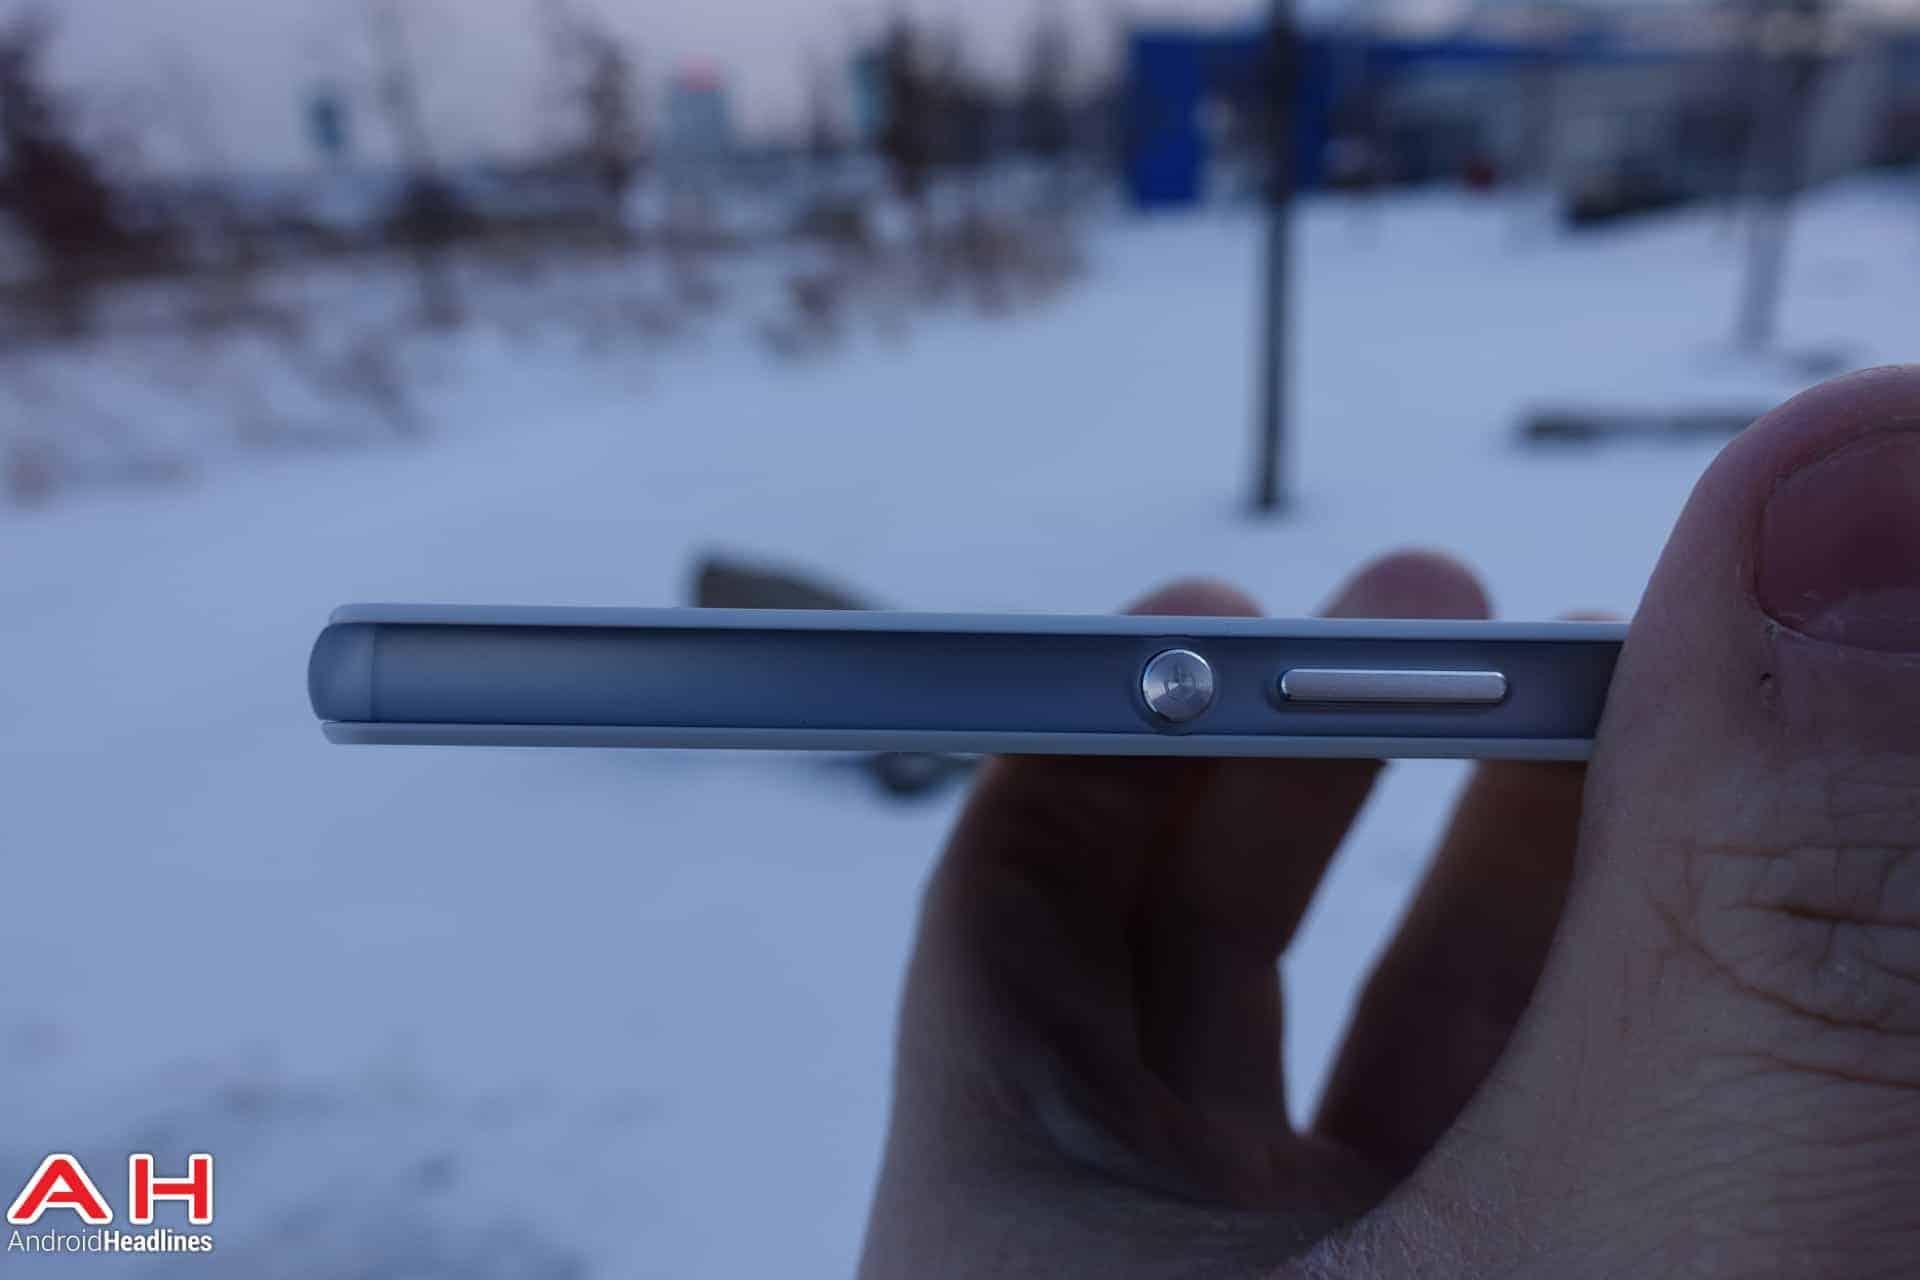 Sony-Xperia-Z3-Compact-AH-03795